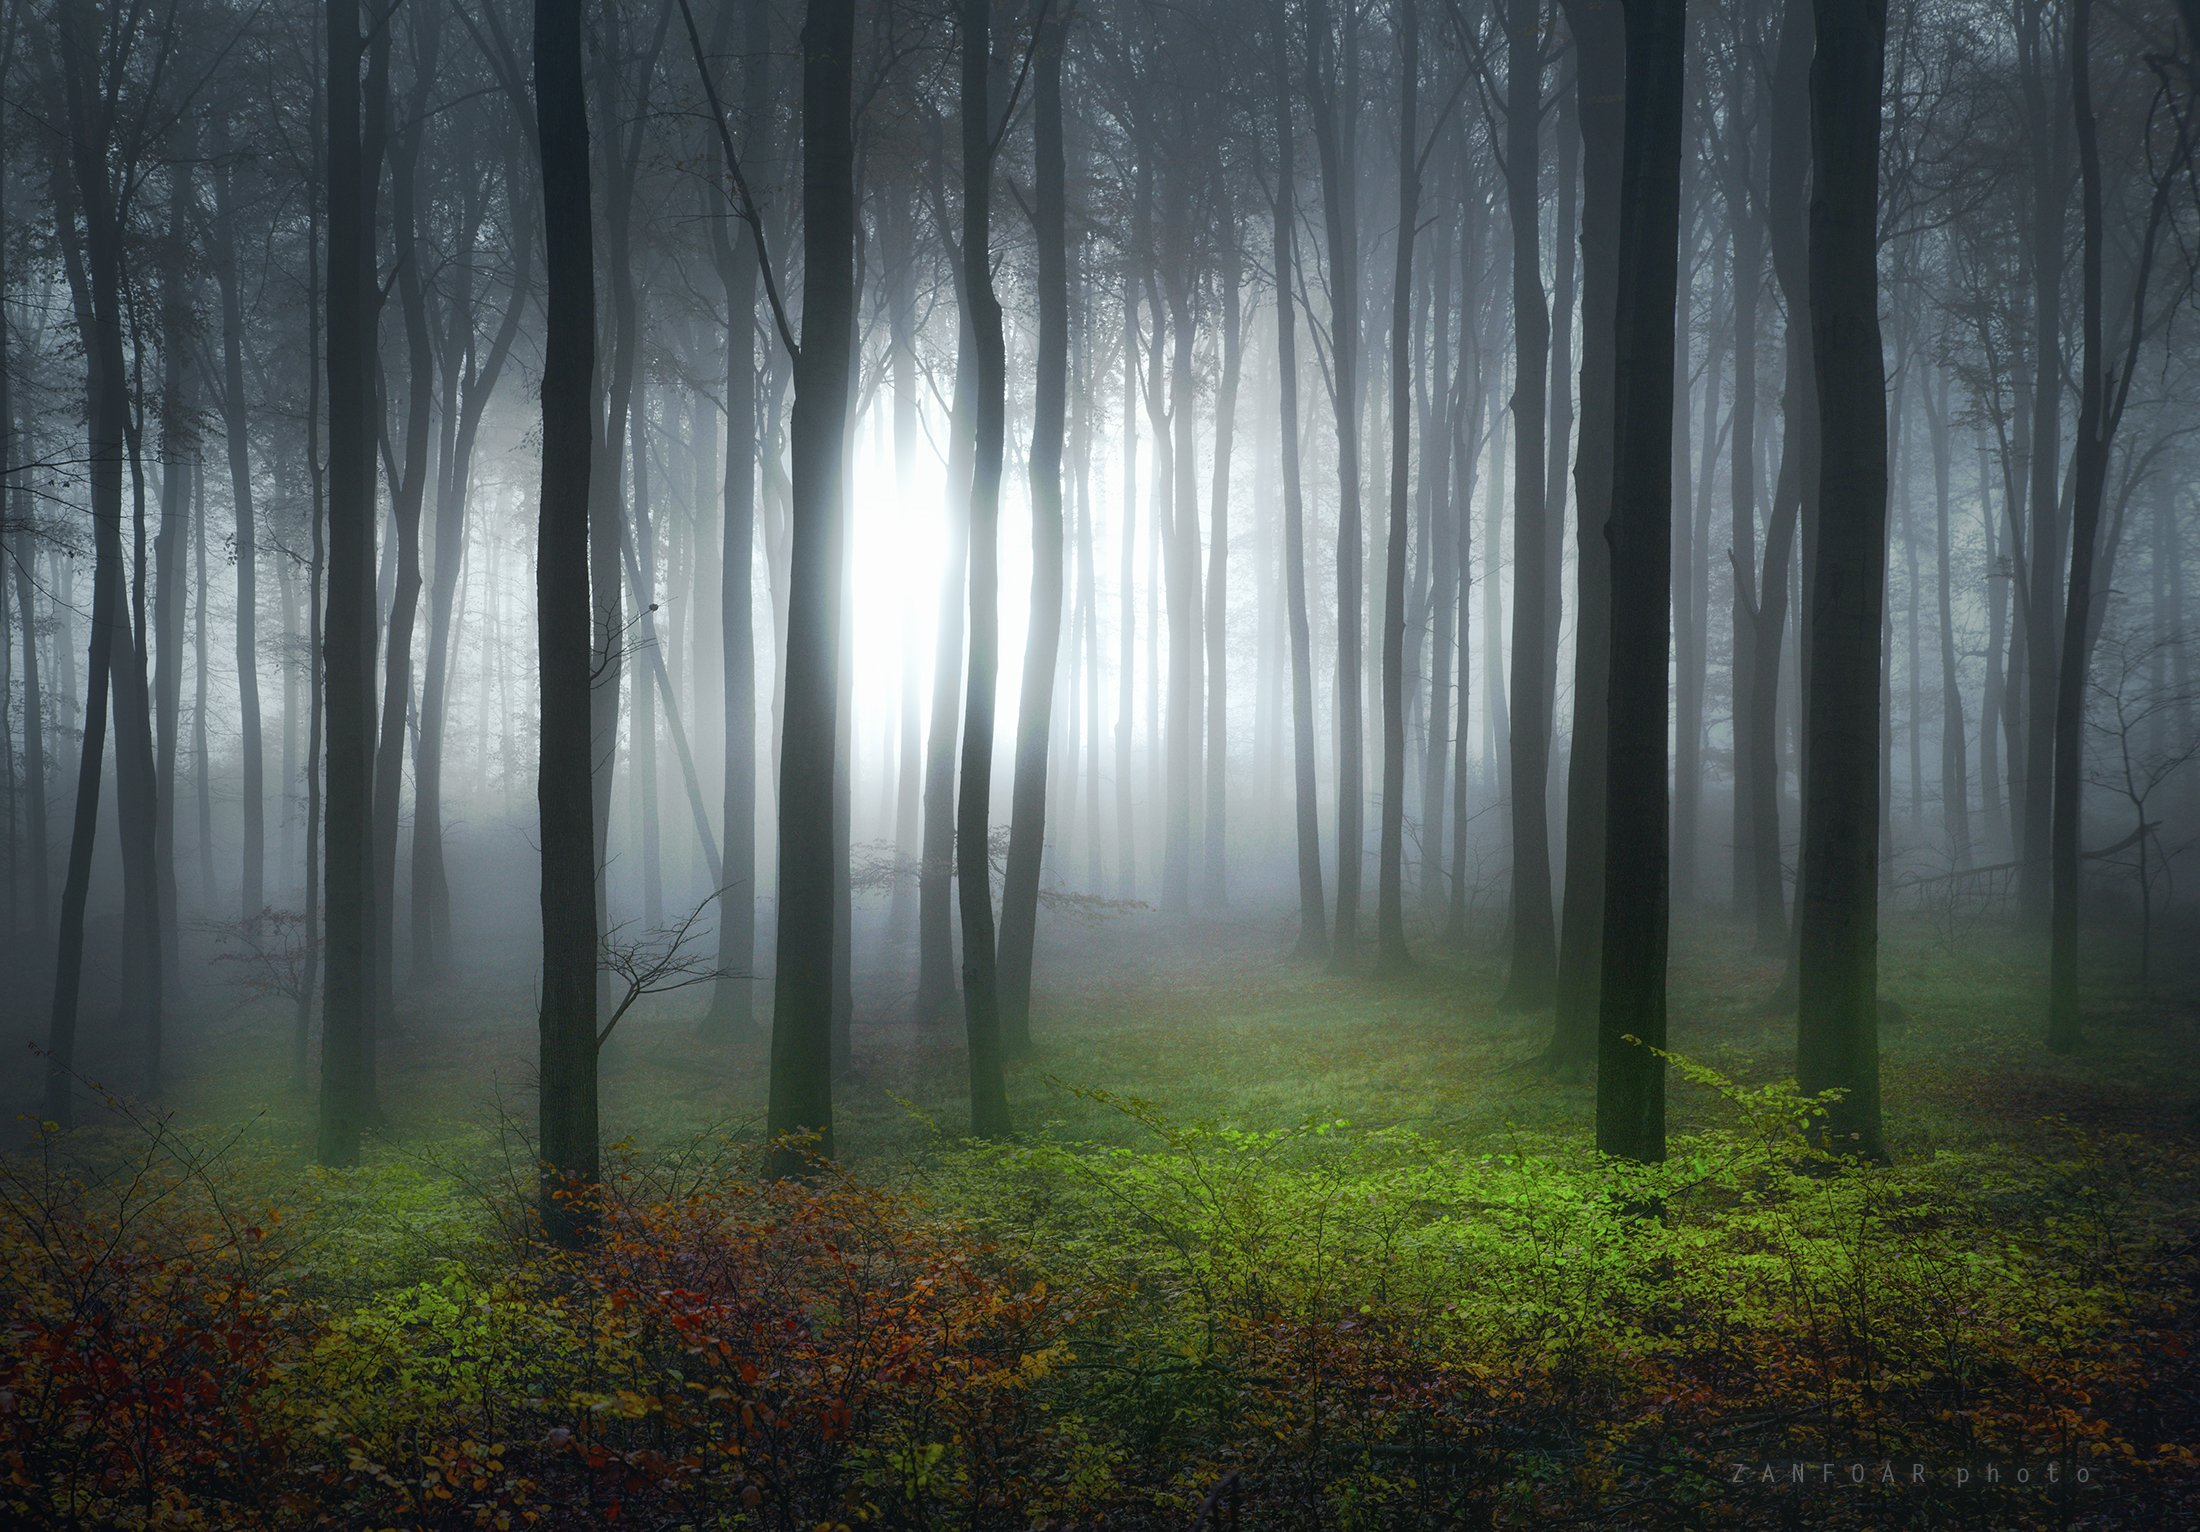 мистический лес,лес,туман, дымка, осень, лес ,никон ,zanfoar ,чешская республика ,никон д750 ,моравия,богемия.занфоар,чехия,  Zanfoar